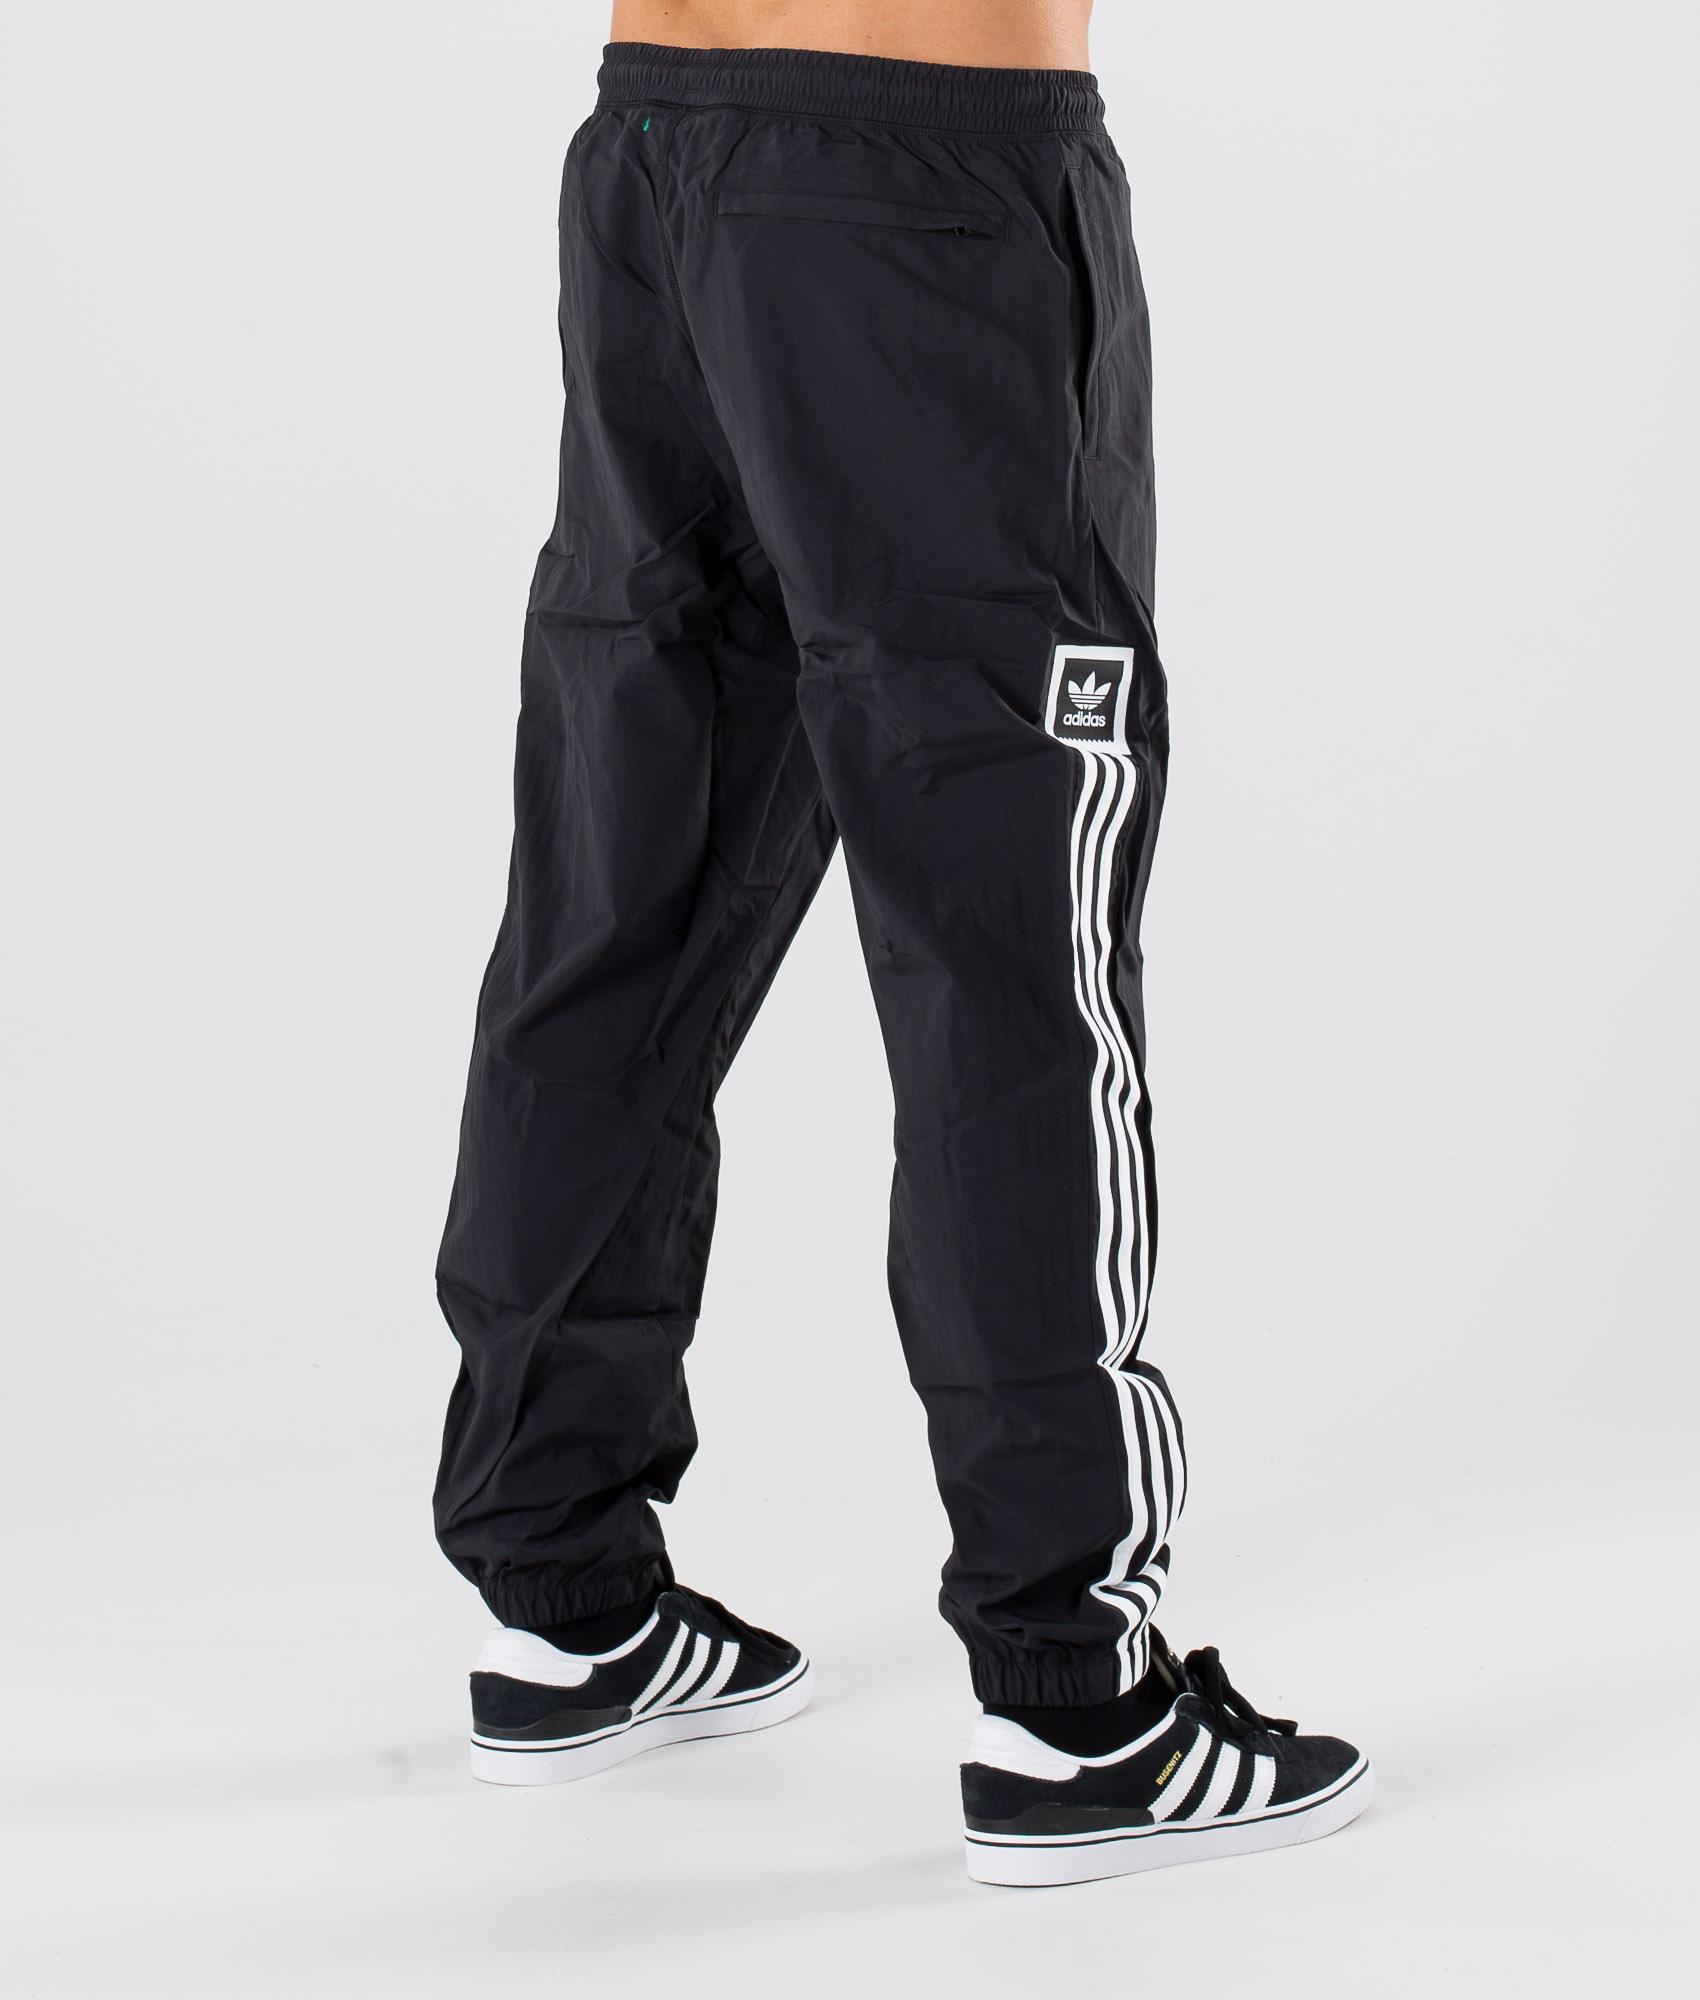 Adidas Skateboarding Standard Wind Pants BlackWhite